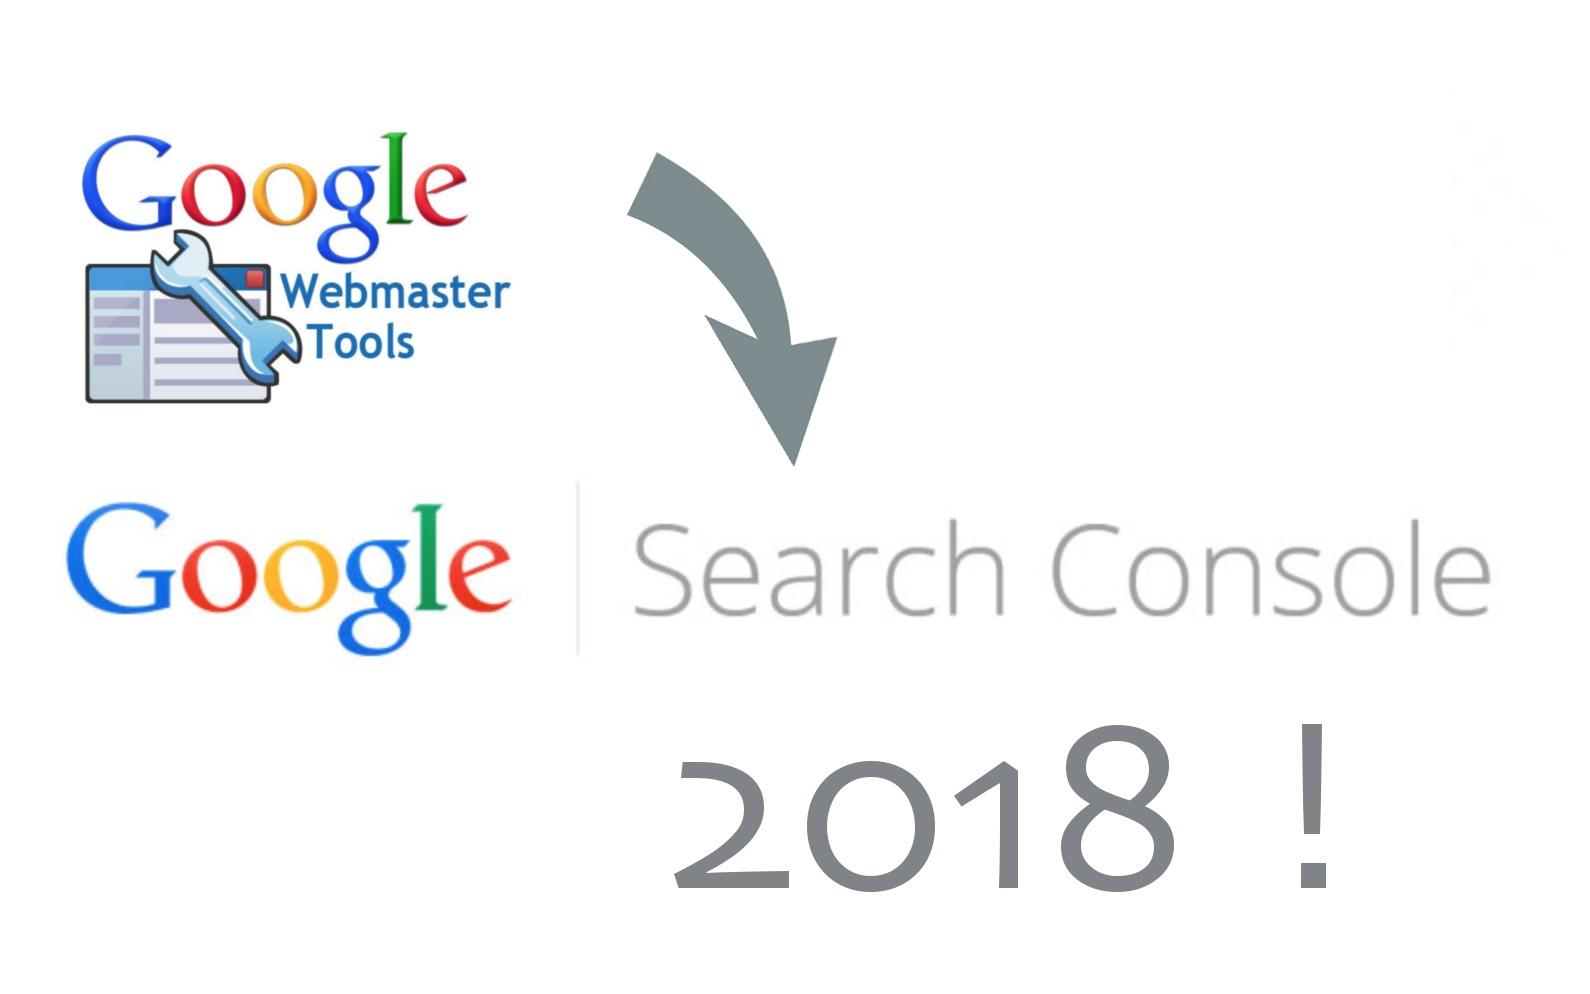 Google Search Console 2018 arrive !